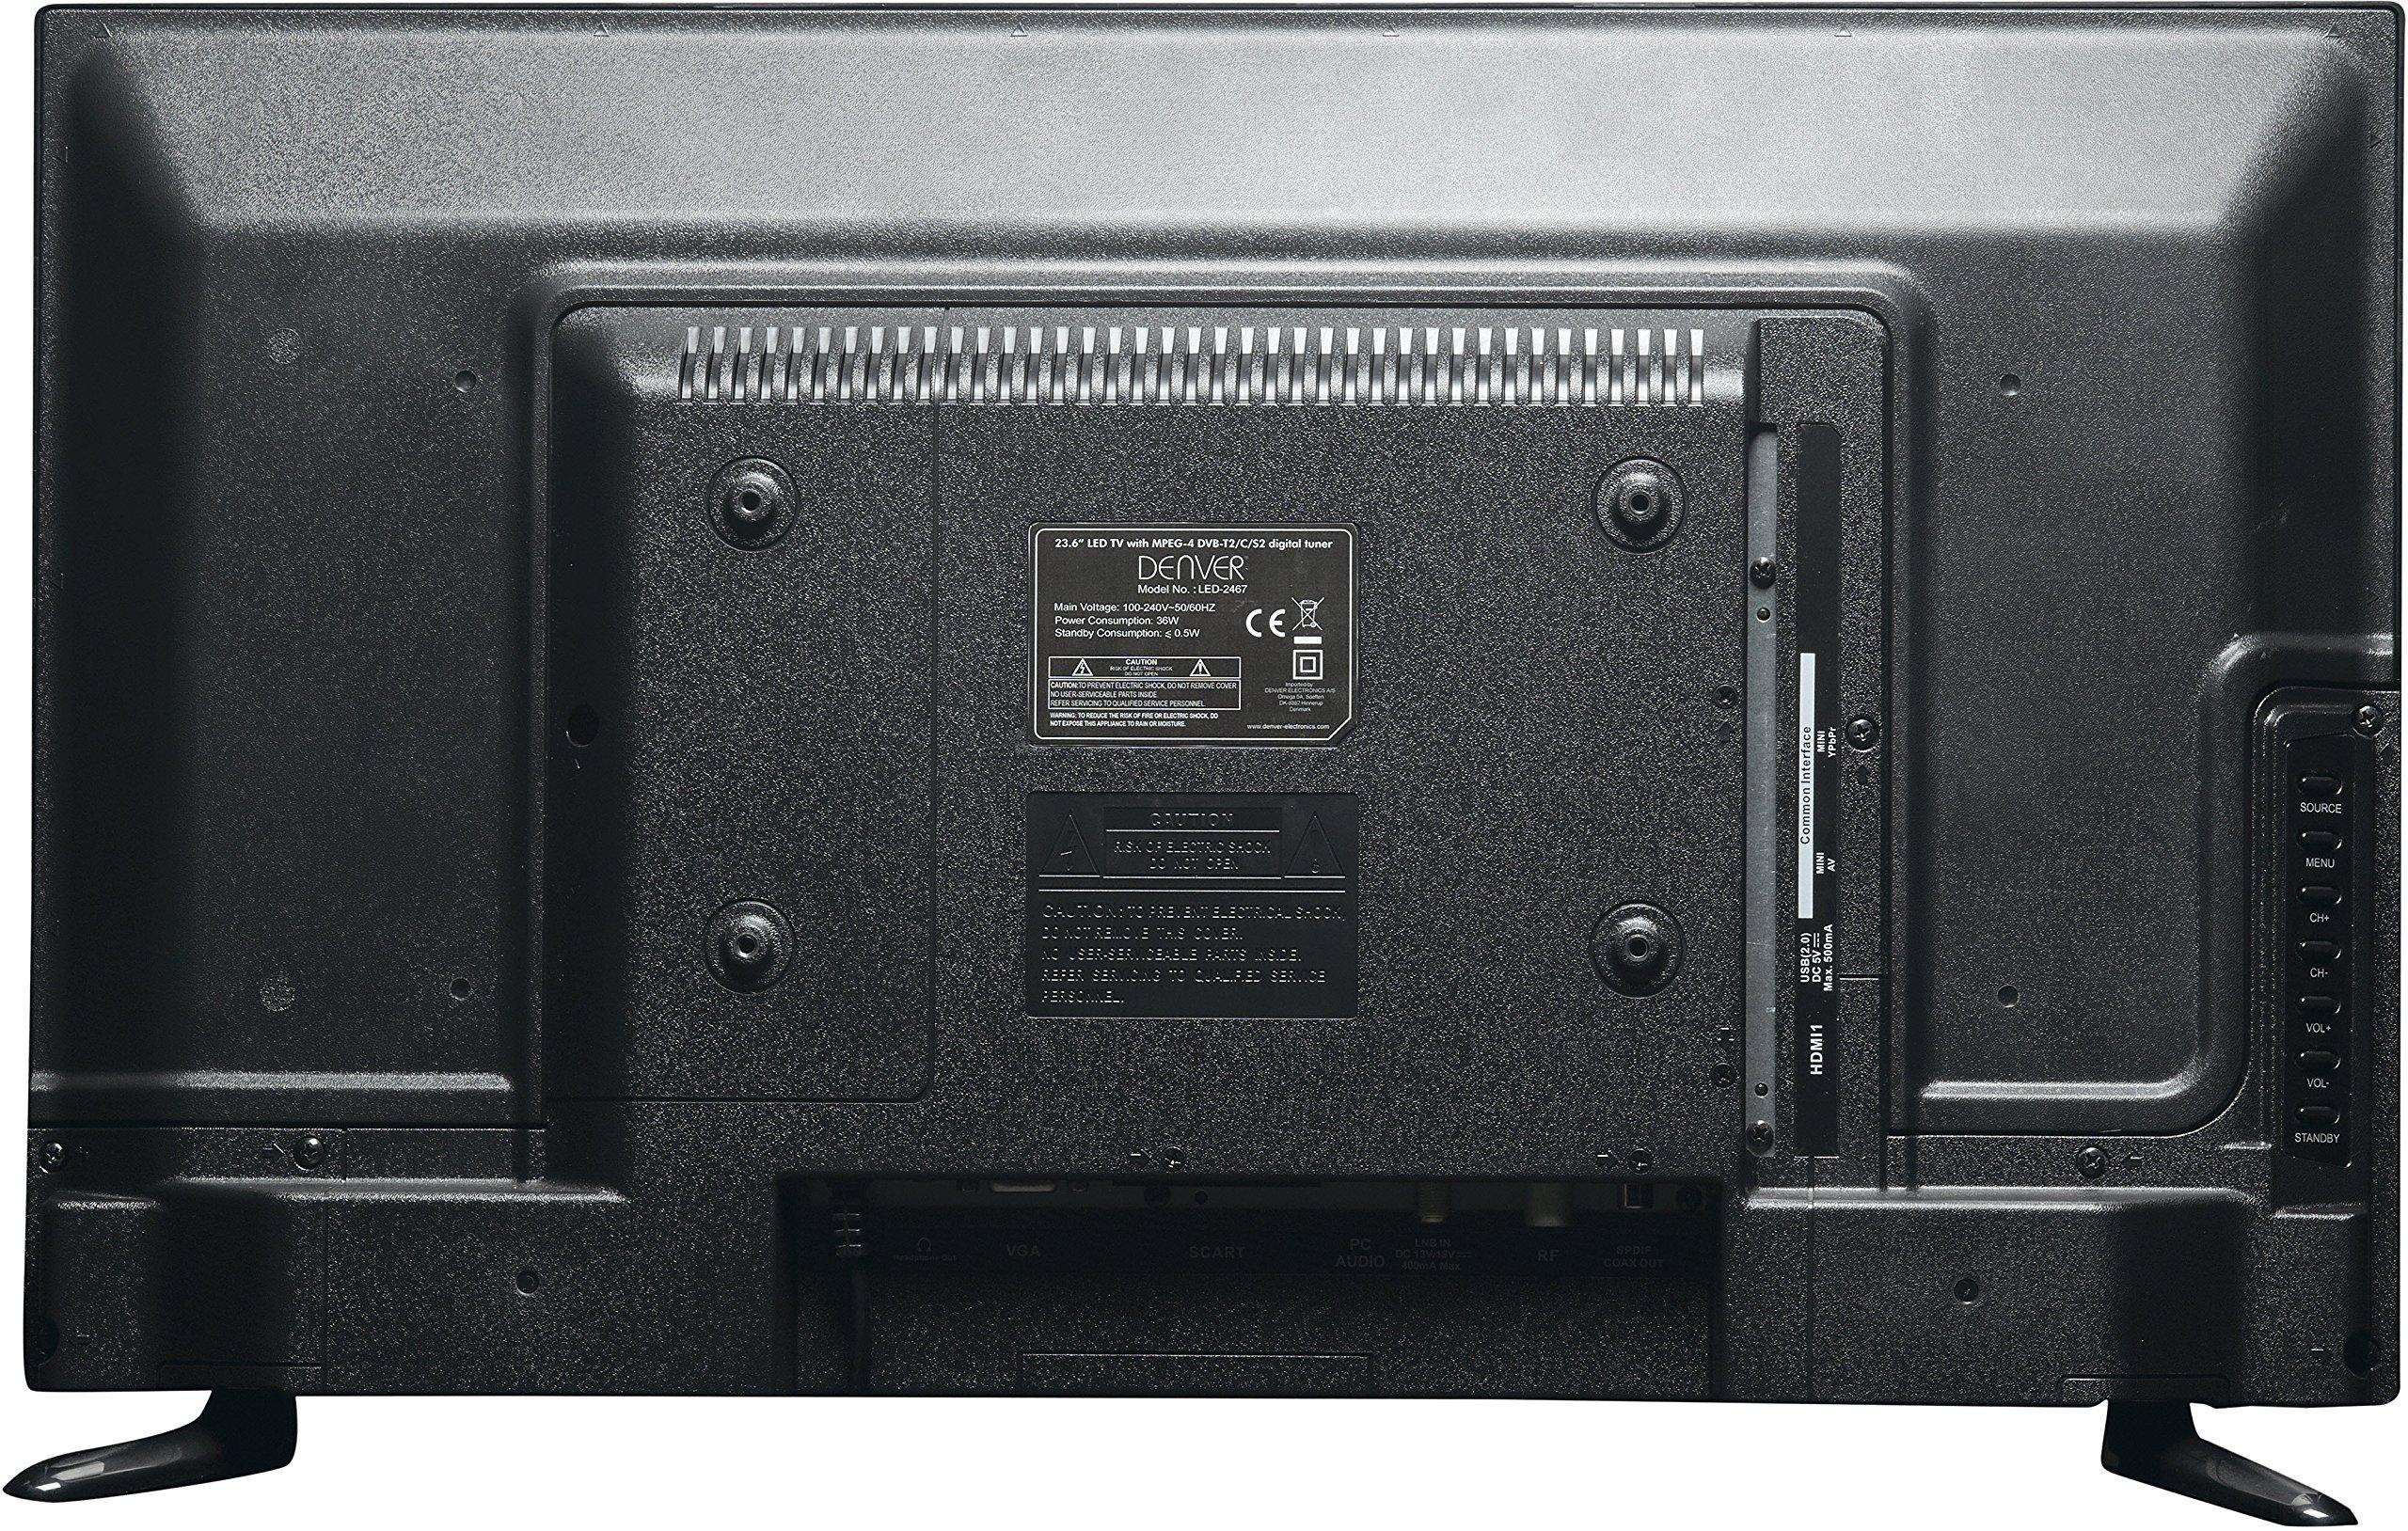 TV DENVER LED-2467 - 23.6/59.9CM - FULL HD - DVB-T2: Amazon.es ...